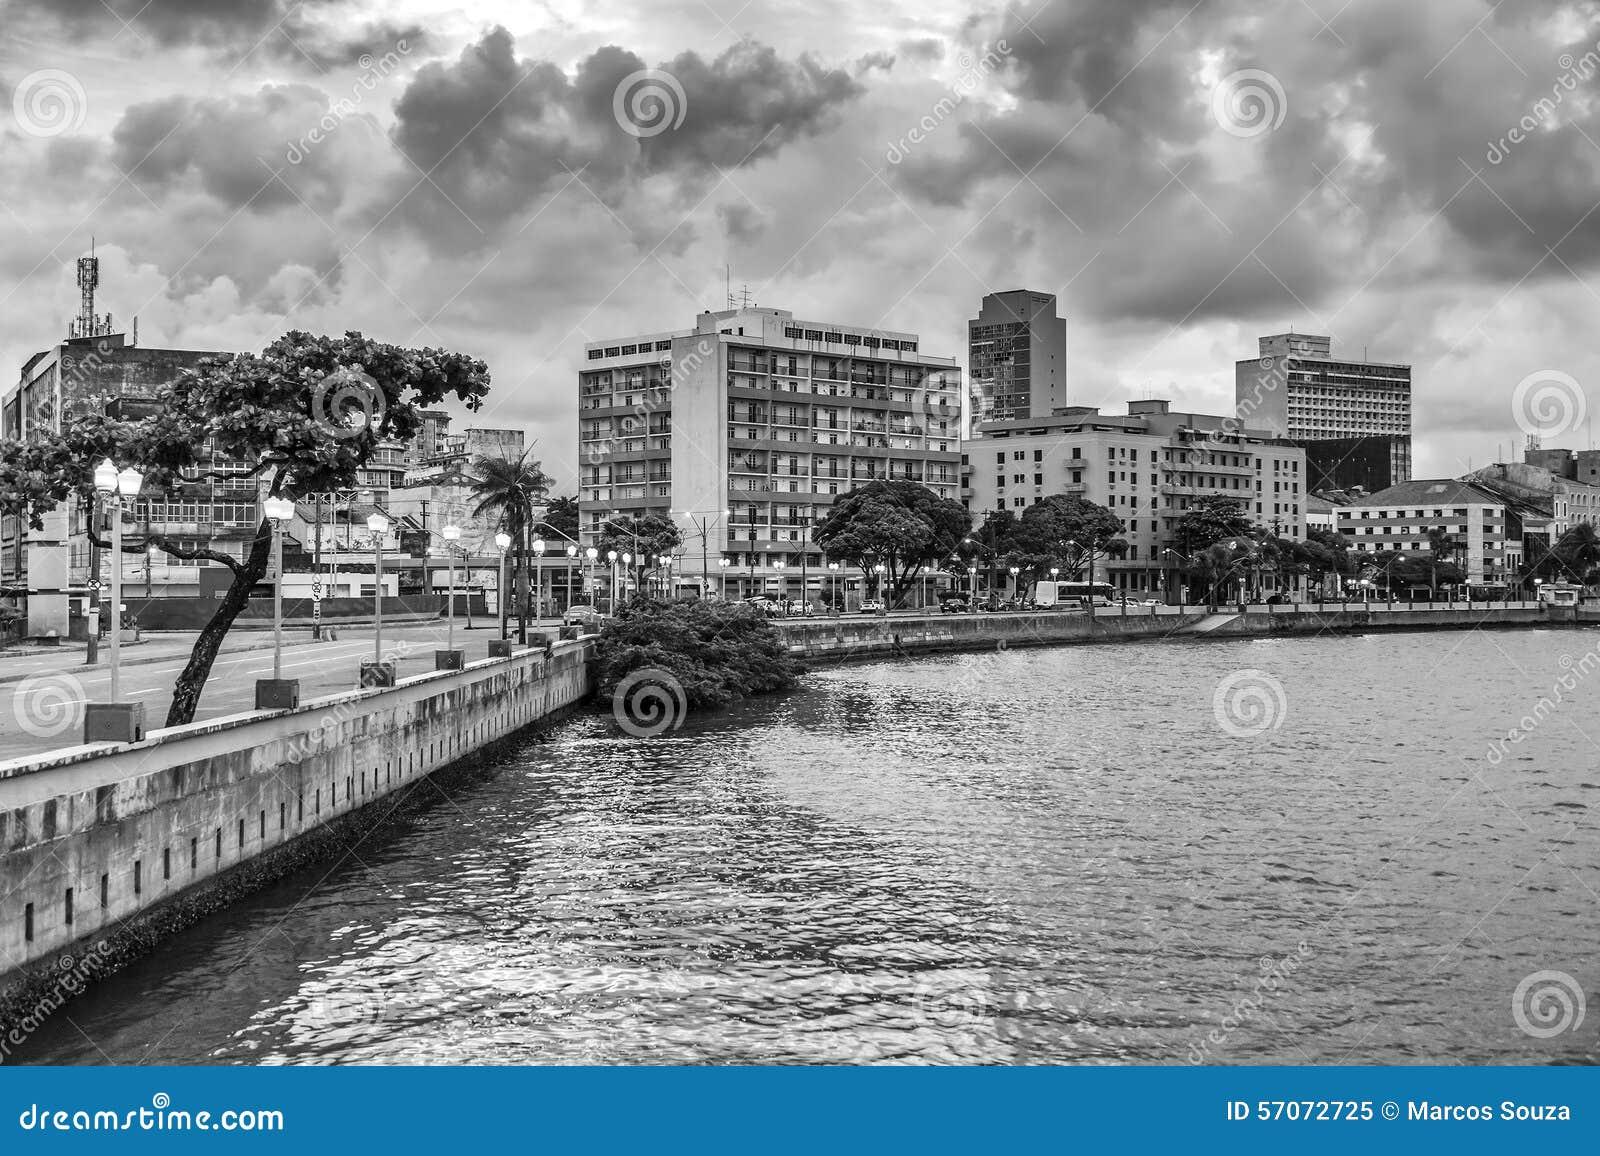 Recife in Pernambuco, Brazilië